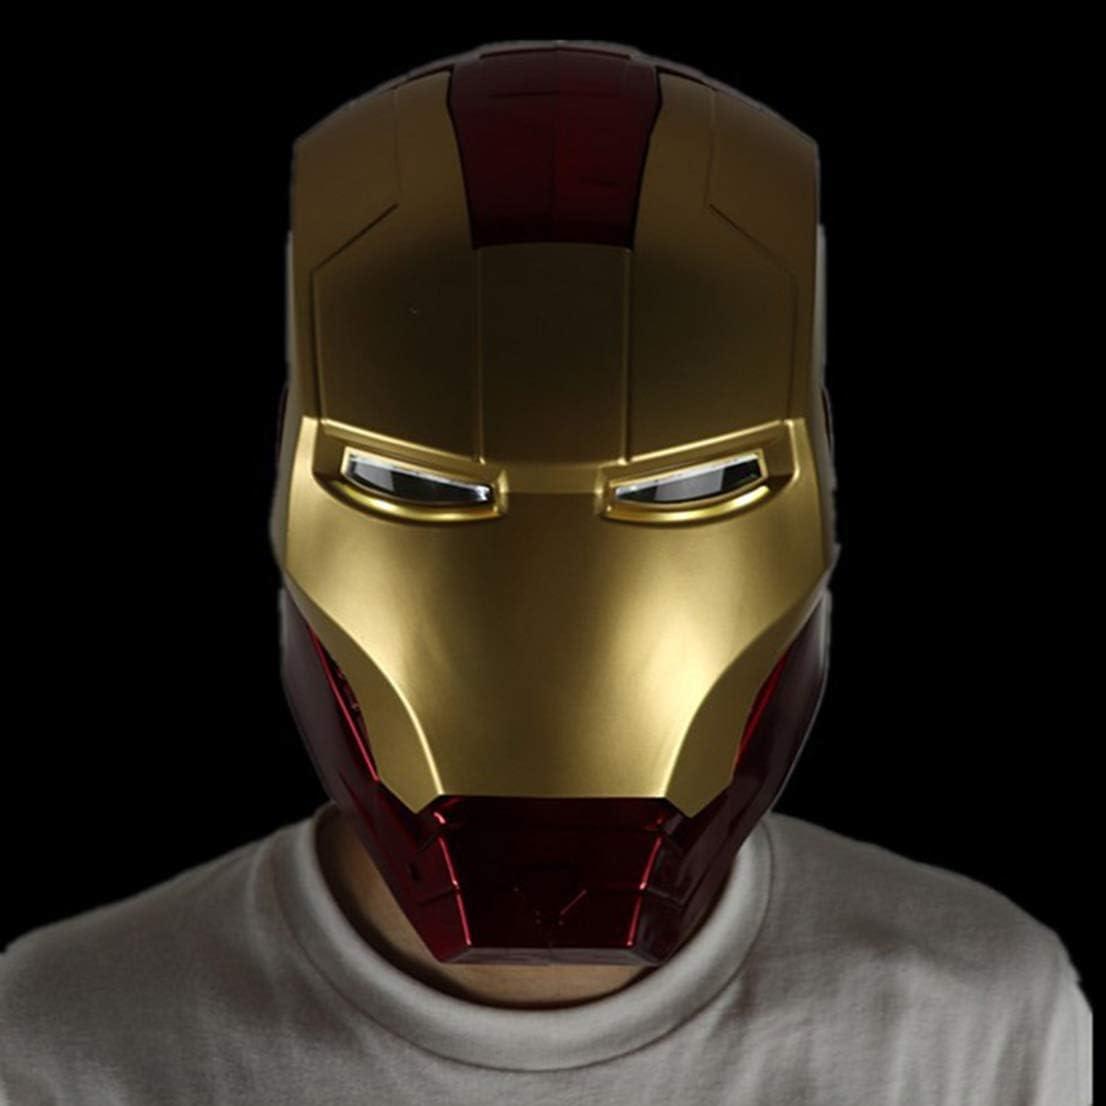 MODRYER Iron Man Helm Avengers 1//1 Toy Modell Maske Wearable und Luminous Spielzeug Film Cosplay Props geeignet f/ür Halloween-Partei-Maskerade,Red